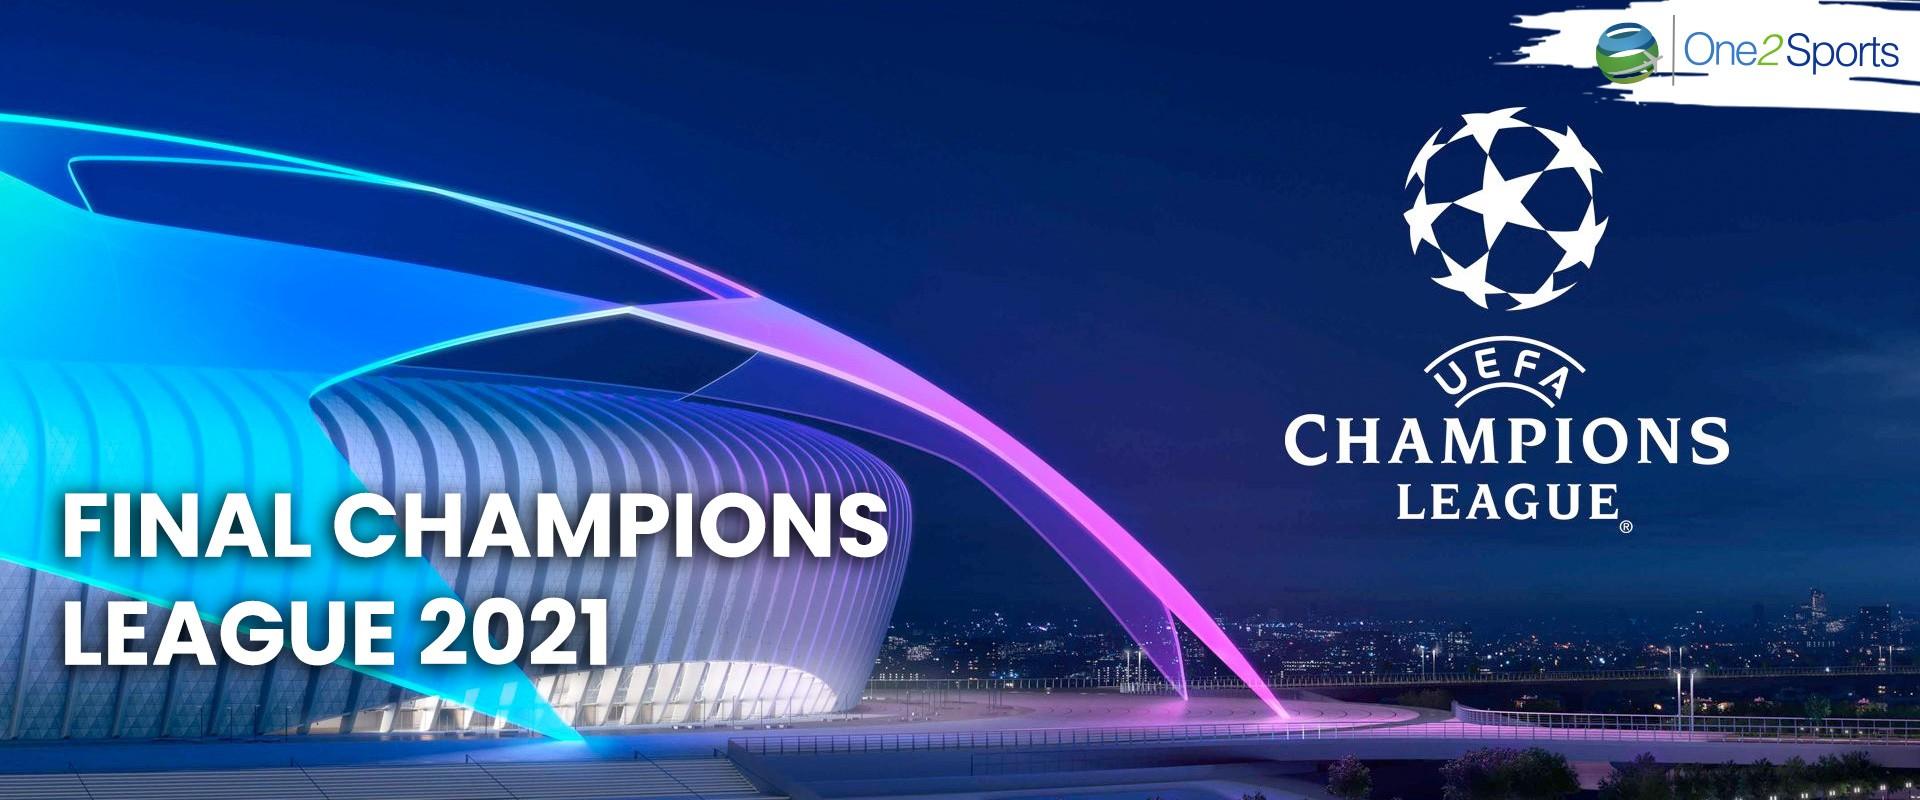 Final Champions League 2021 - 6 noches